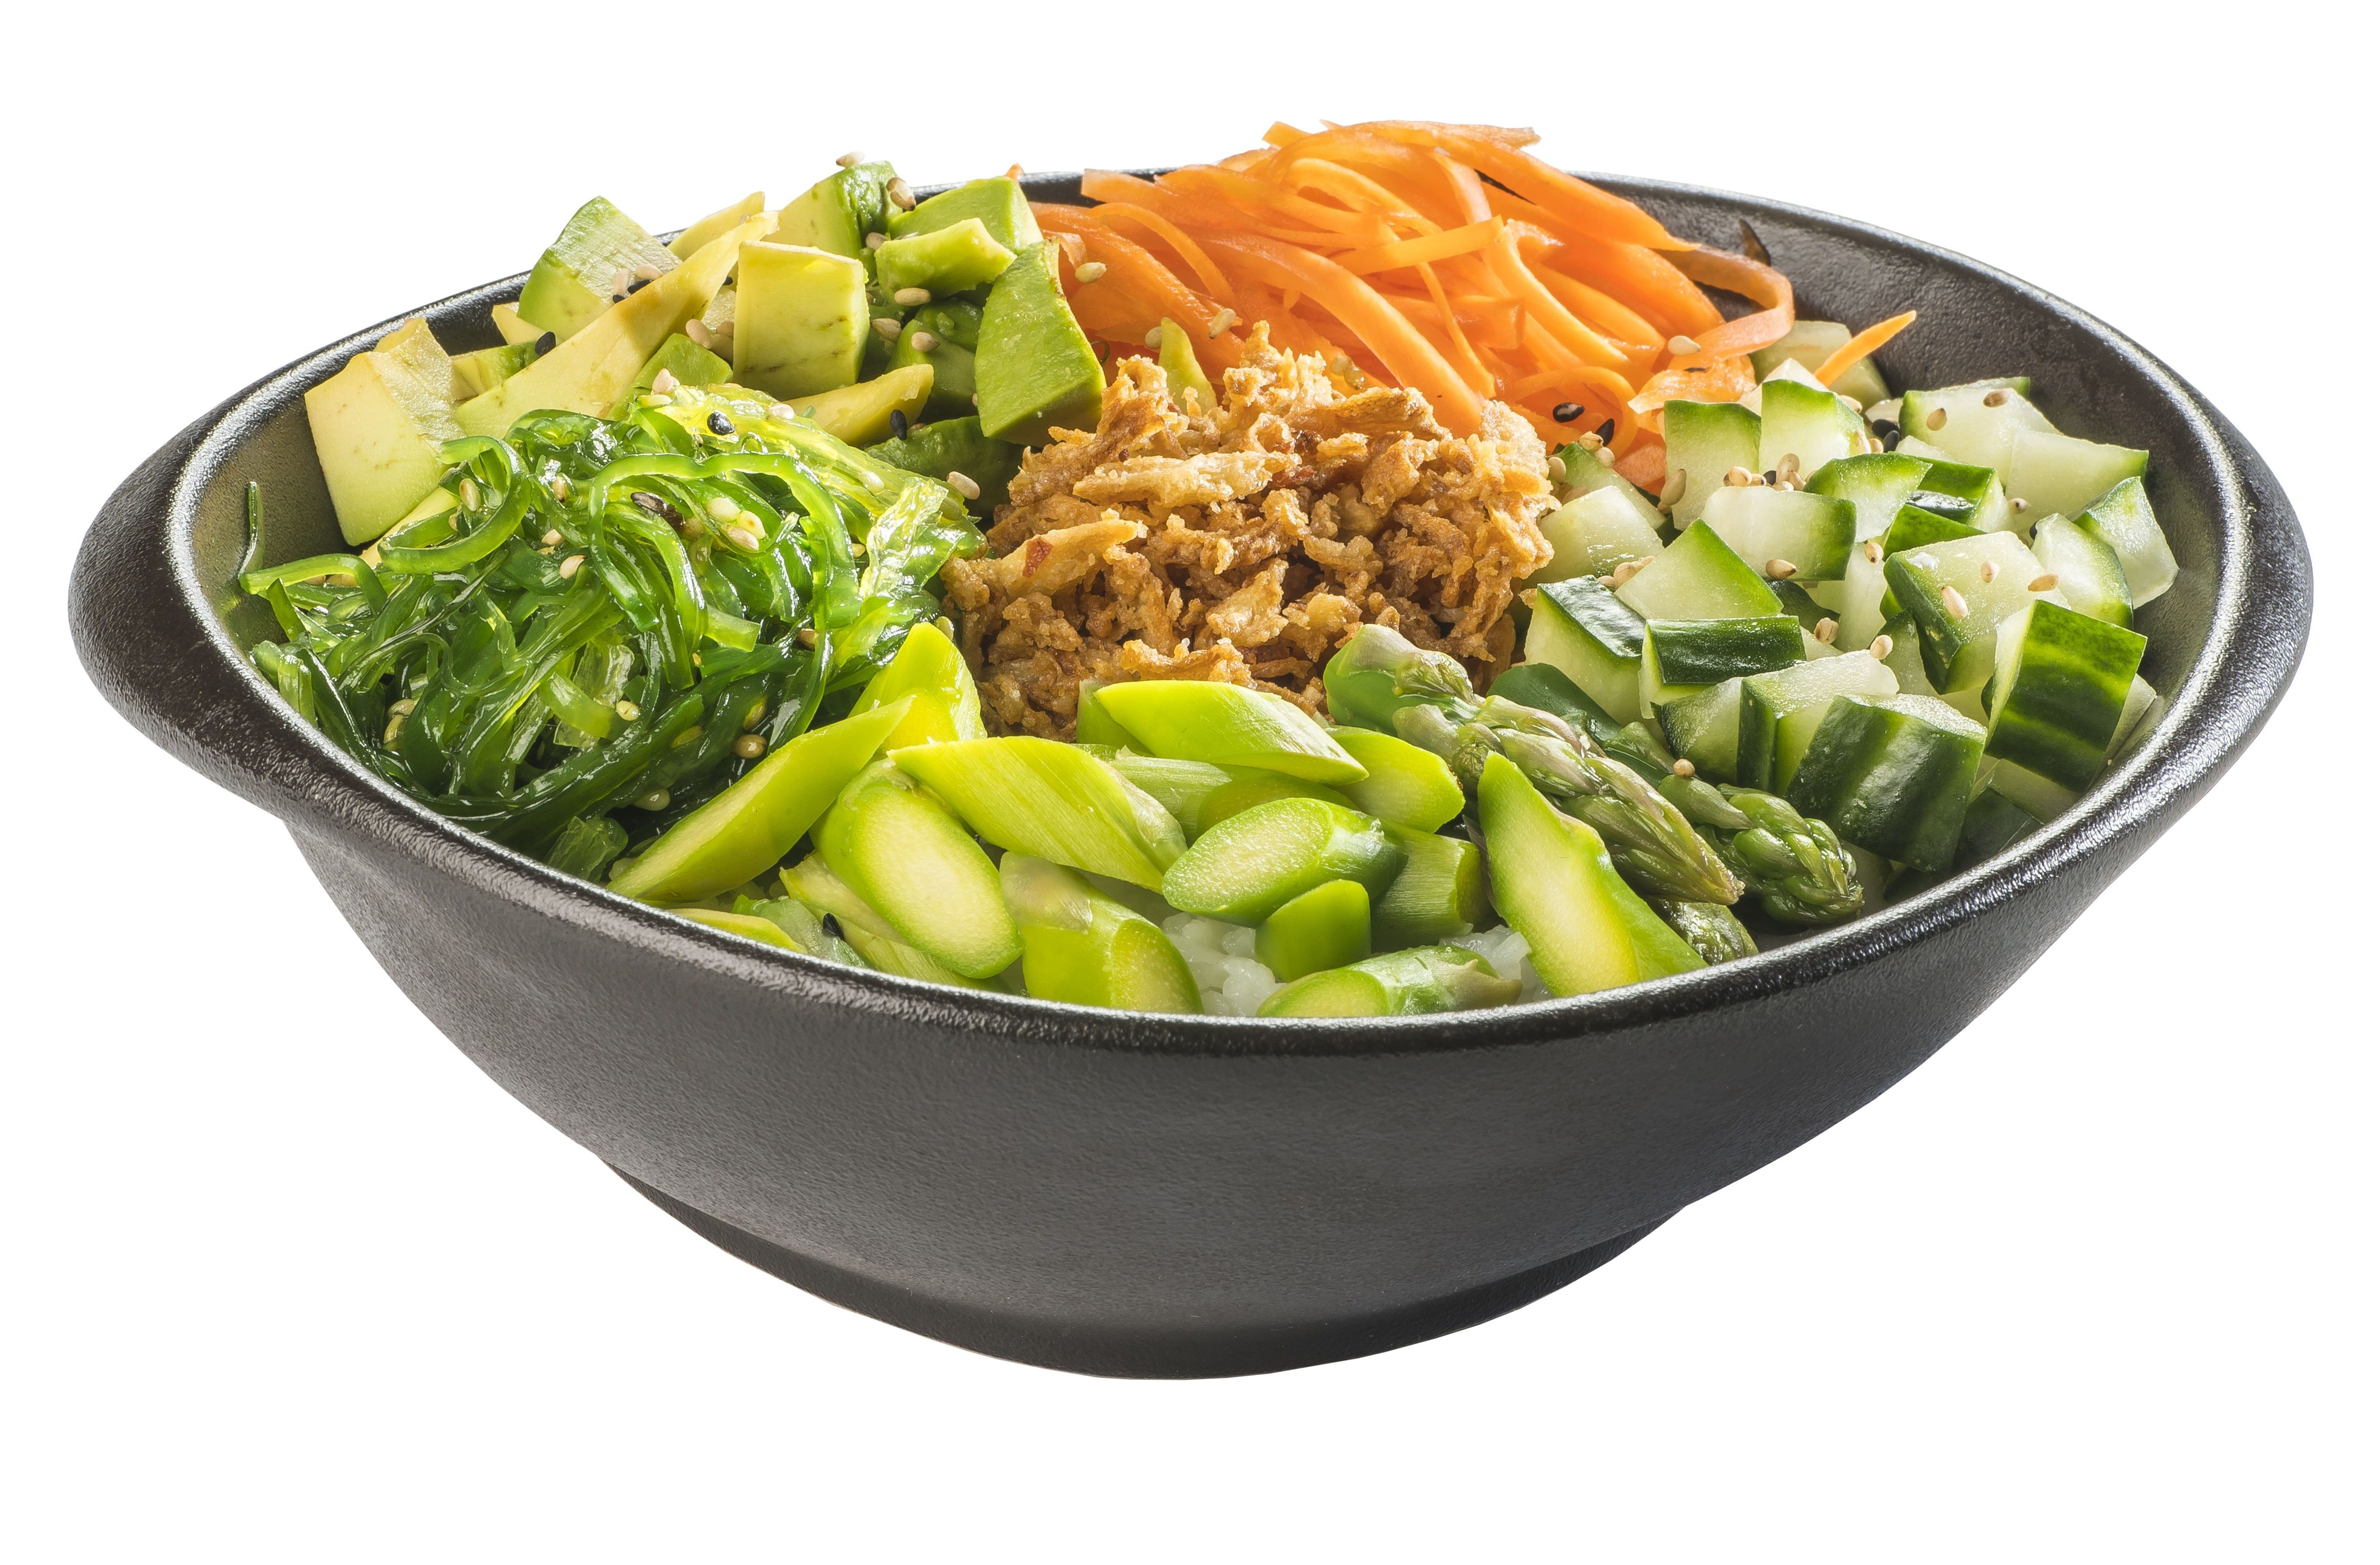 Poke vegetal  6,80€: Carta de Restaurante Sowu